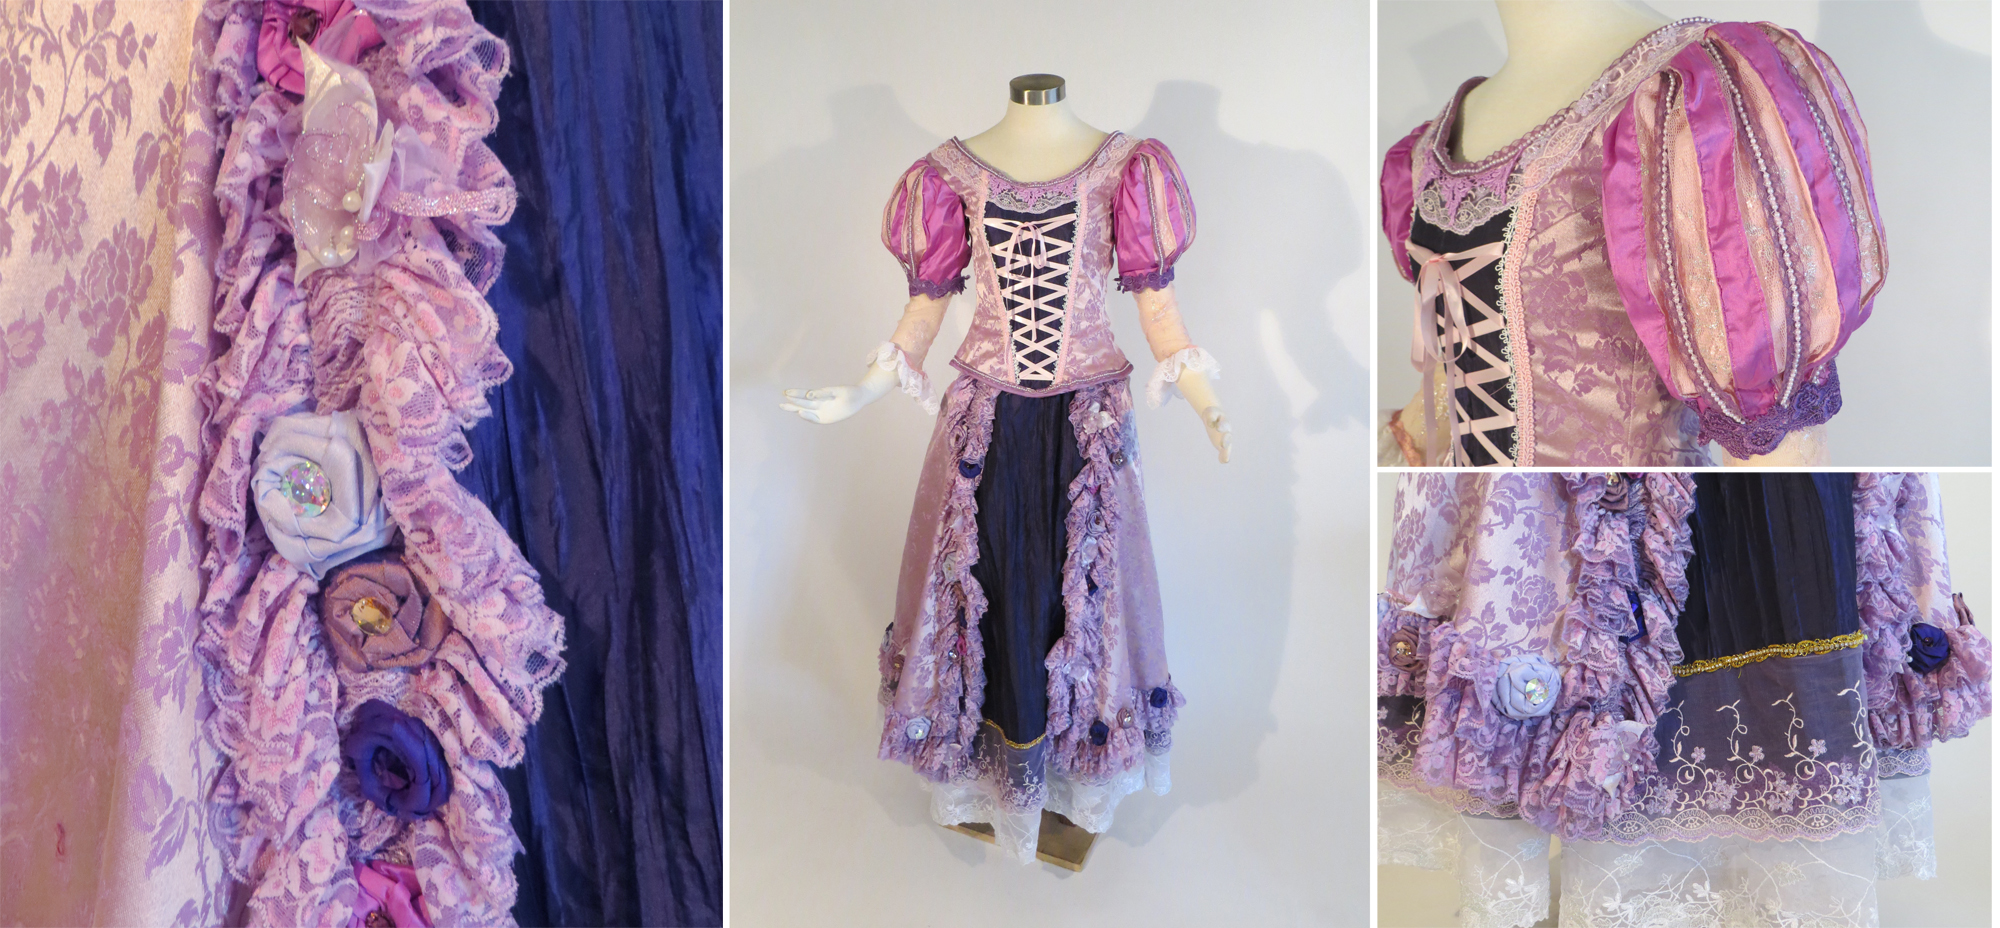 Designer Rapunzel